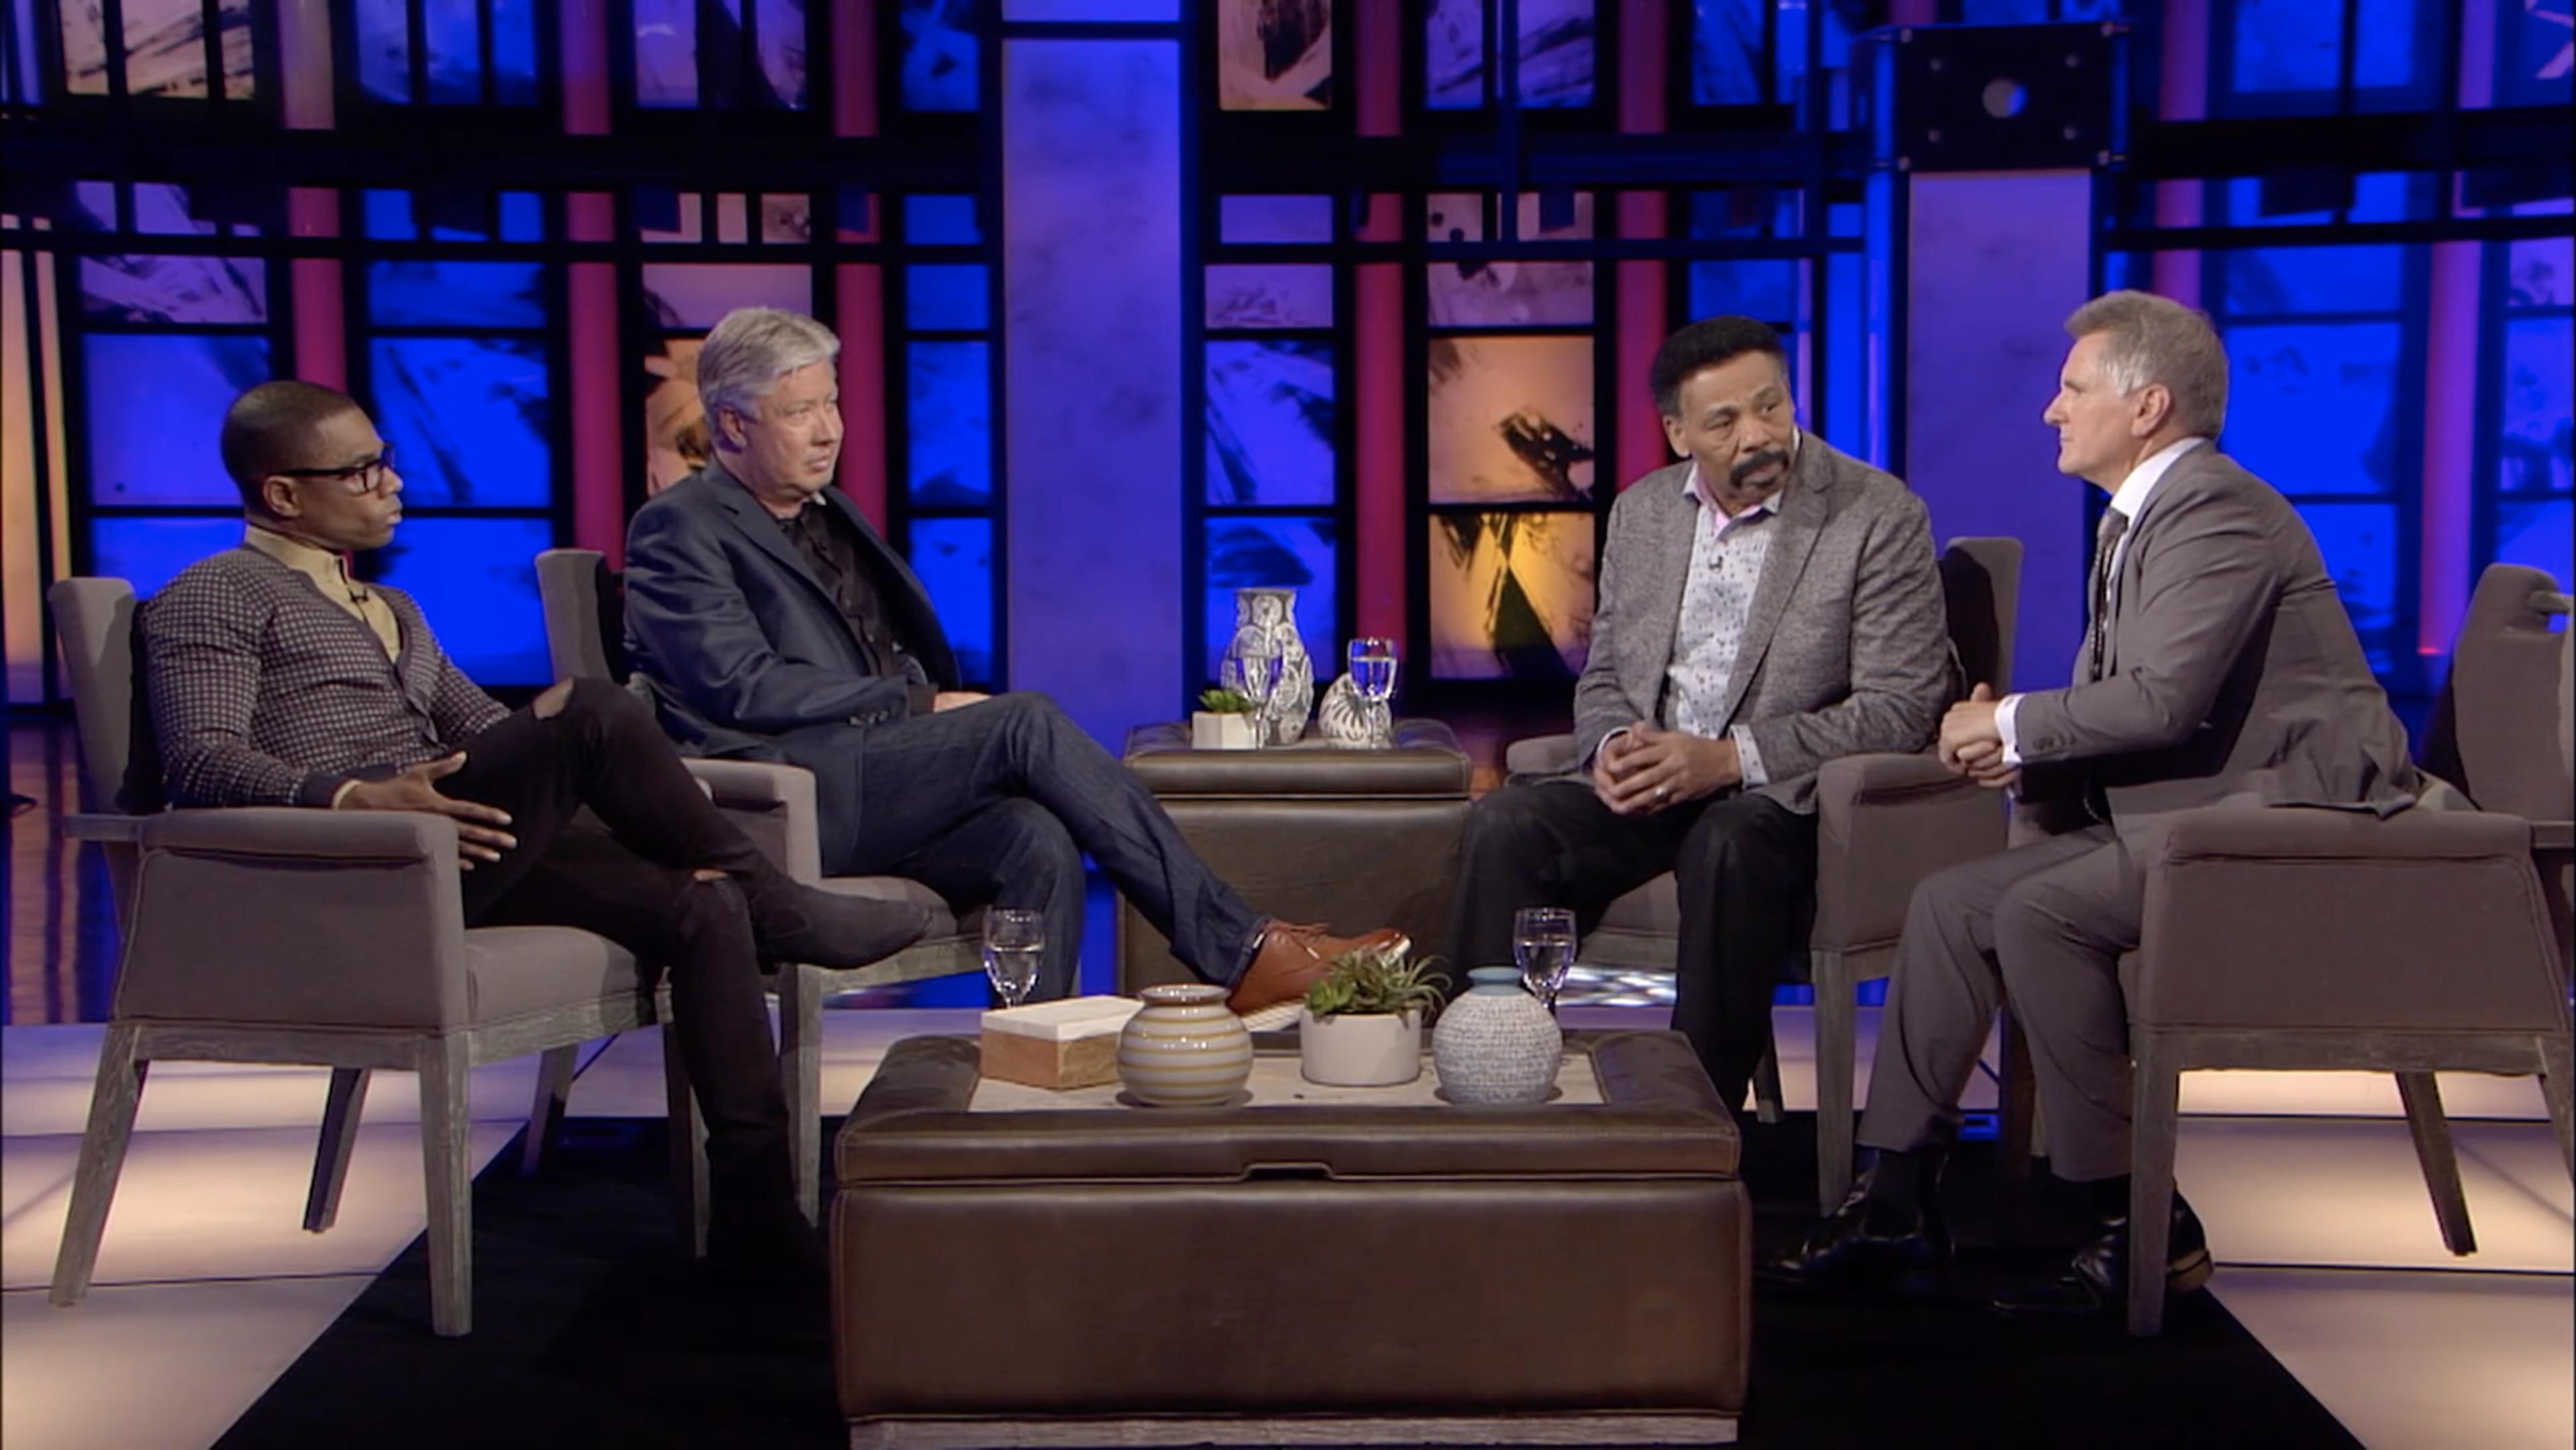 Praise   Kirk Franklin, Dr. Tony Evans, & Robert Morris   March 12, 2020